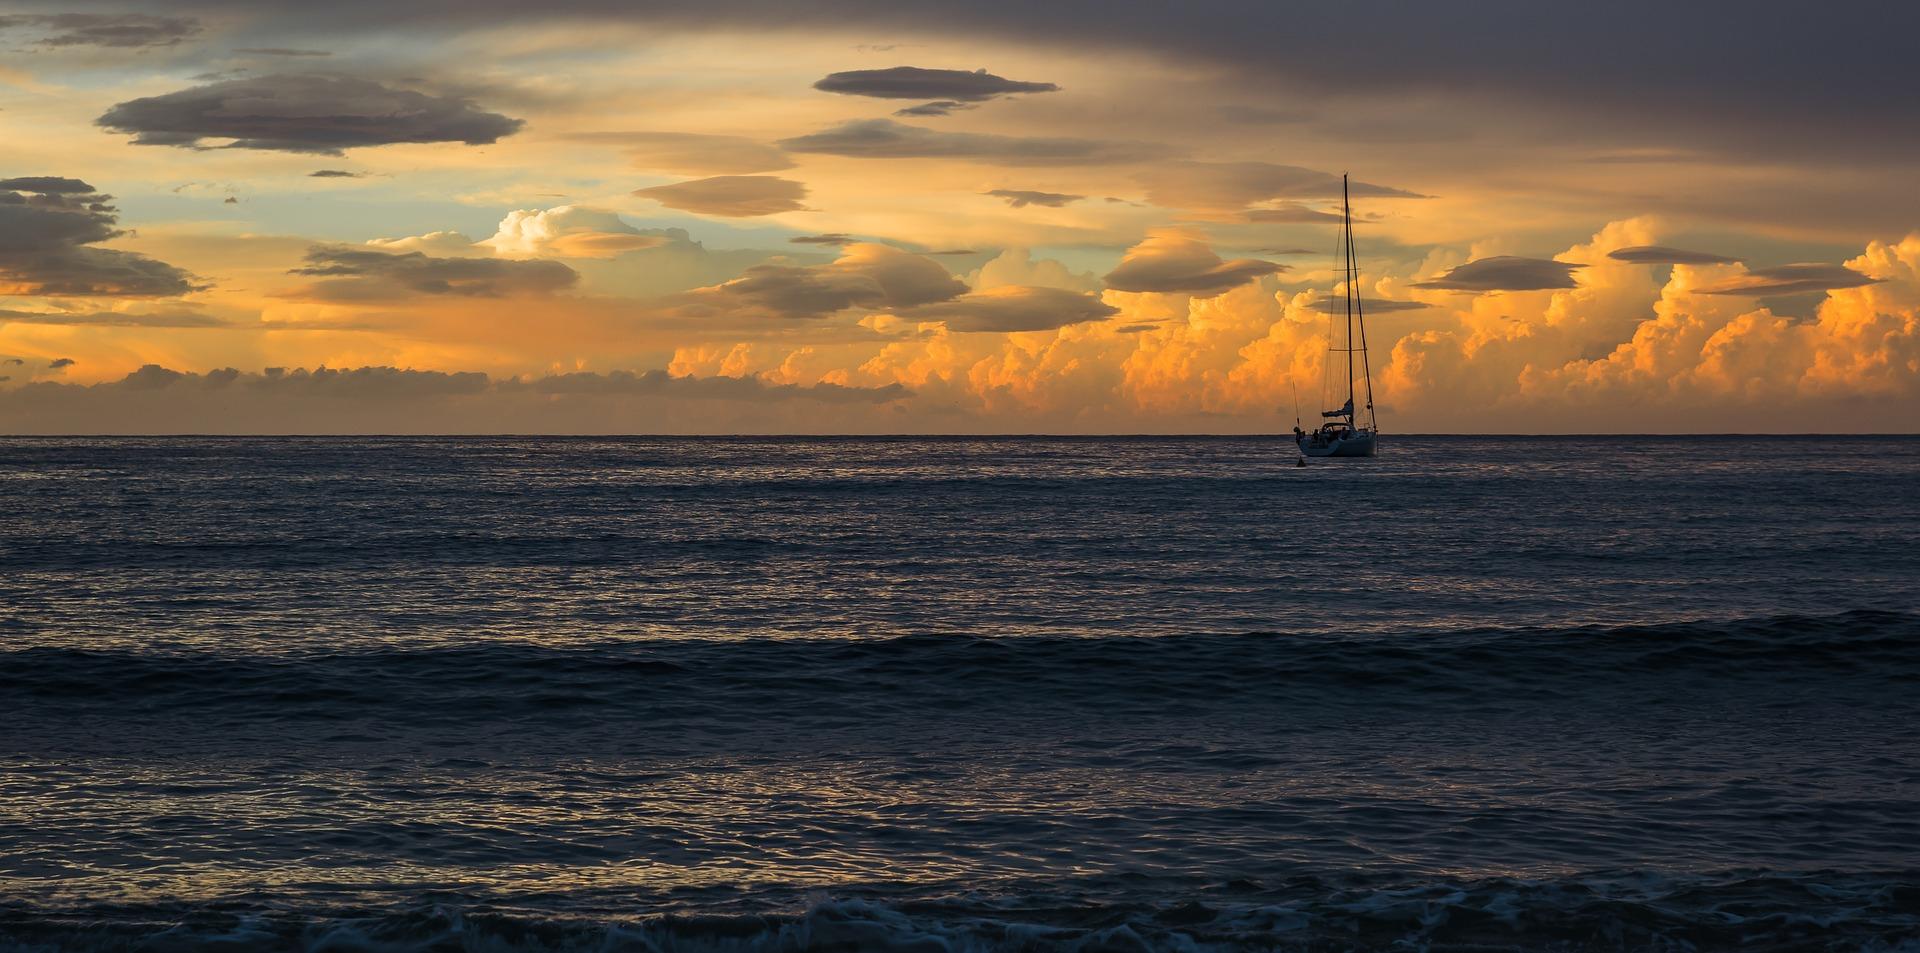 sunset-2015533_1920